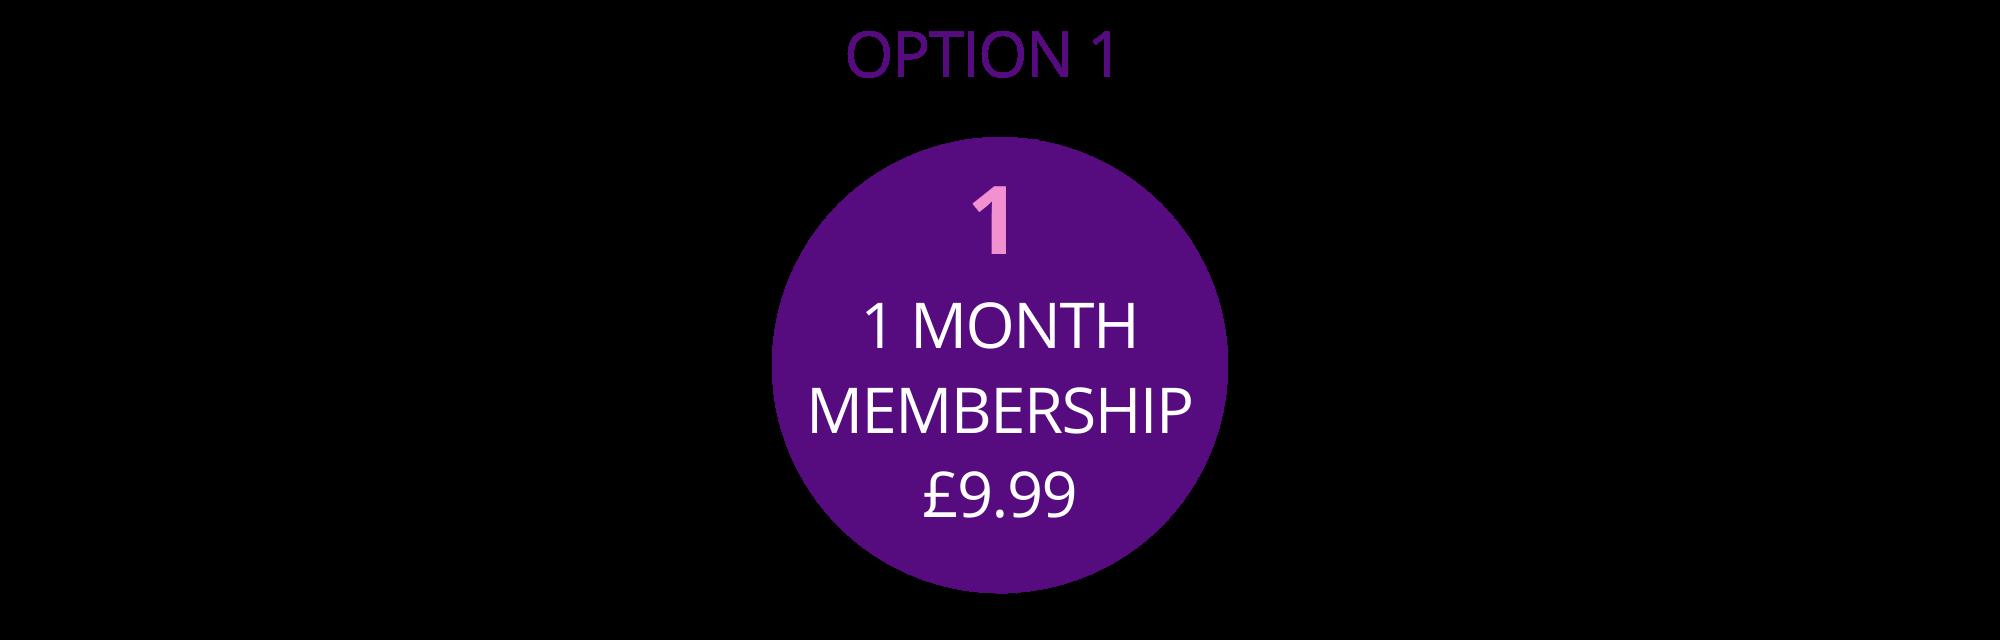 Bandboozled Membership Option 1